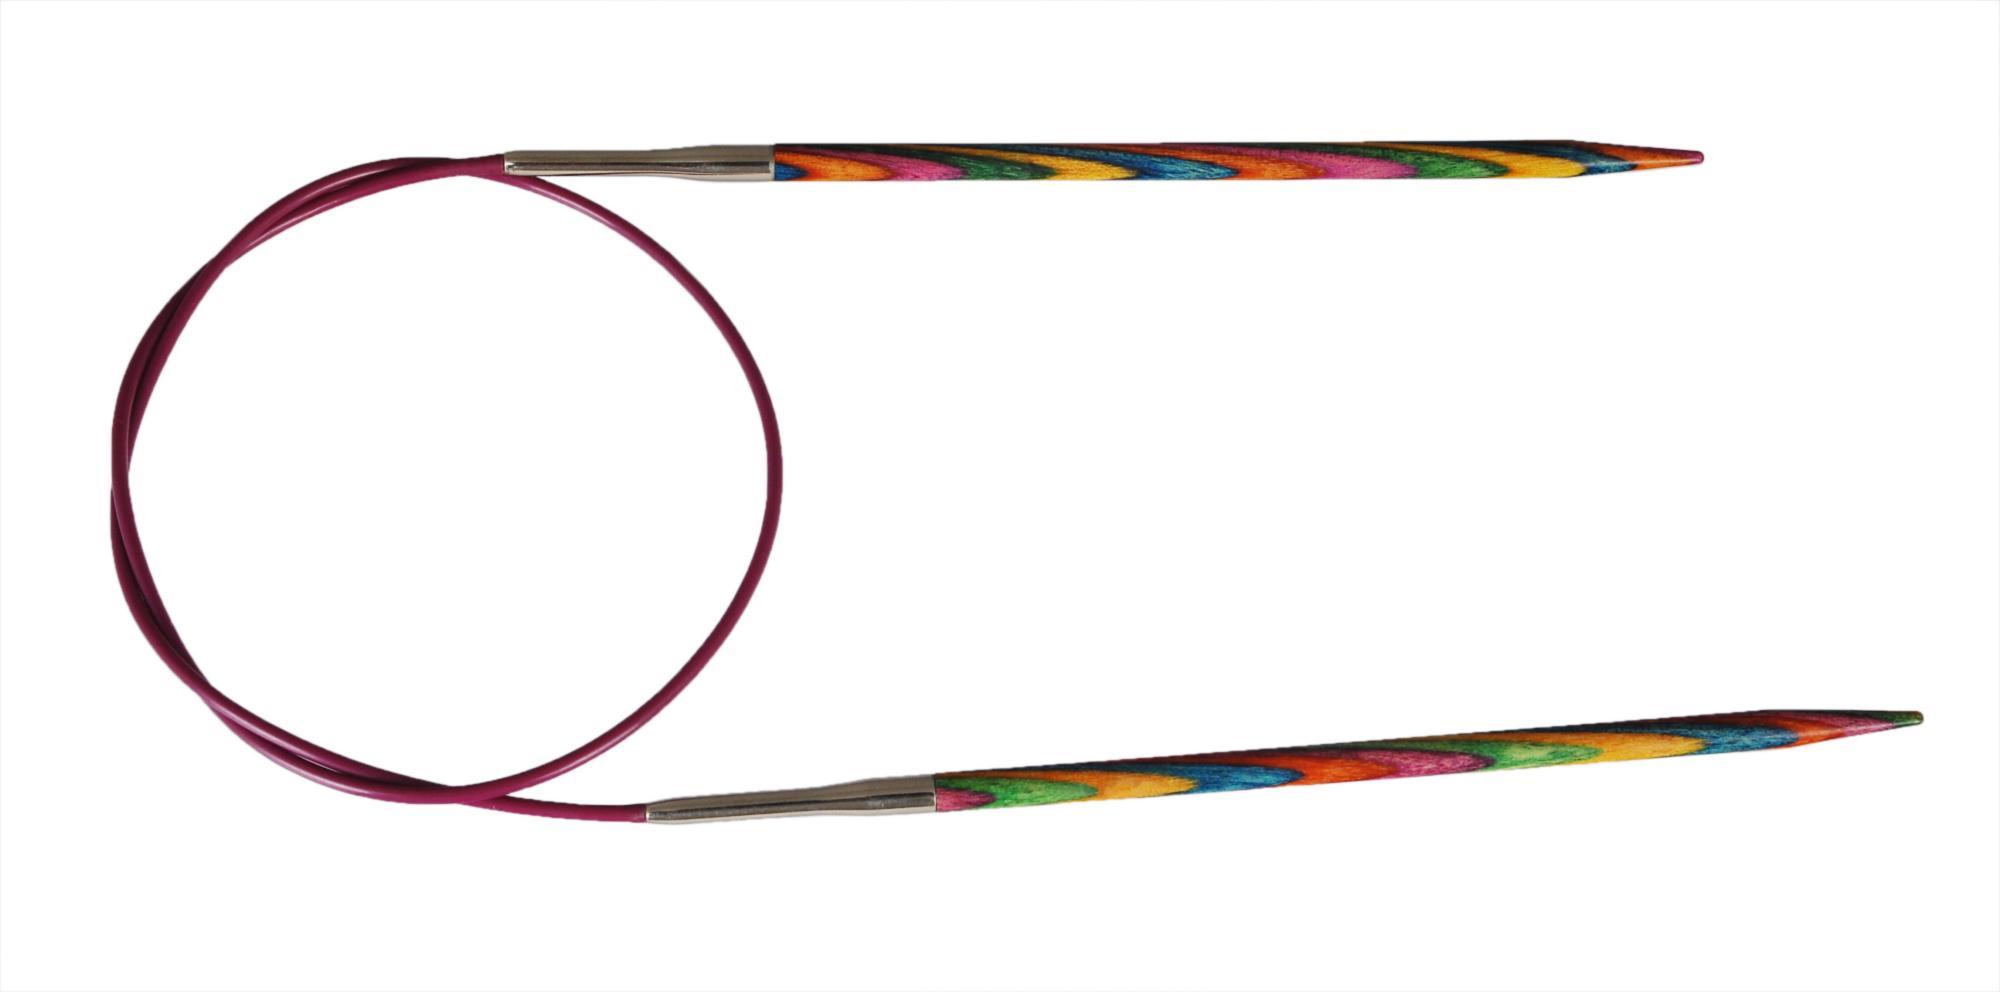 Спицы круговые 60 см Symfonie Wood KnitPro, 21324, 5.00 мм